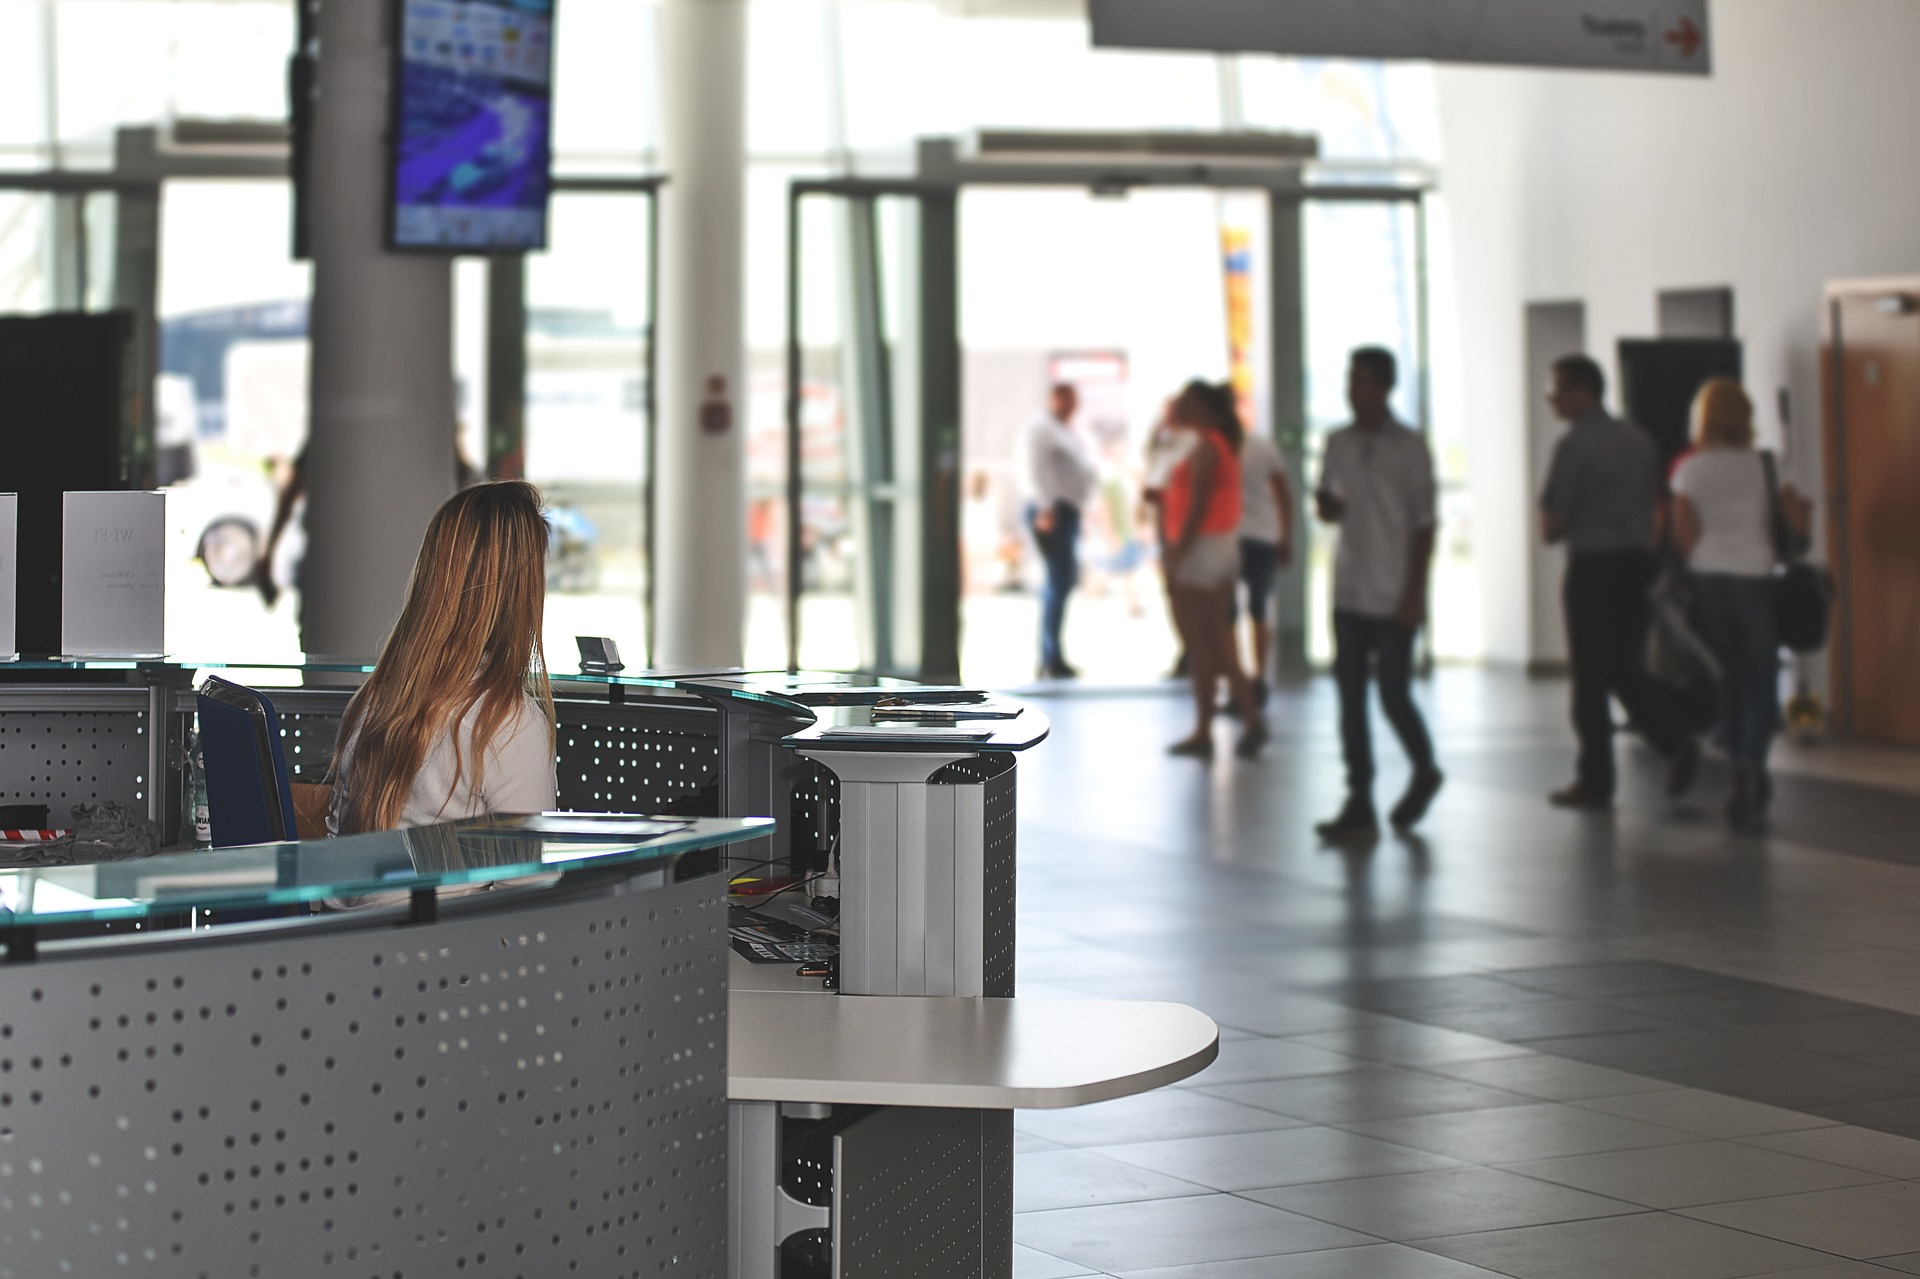 Ualgo customer support service